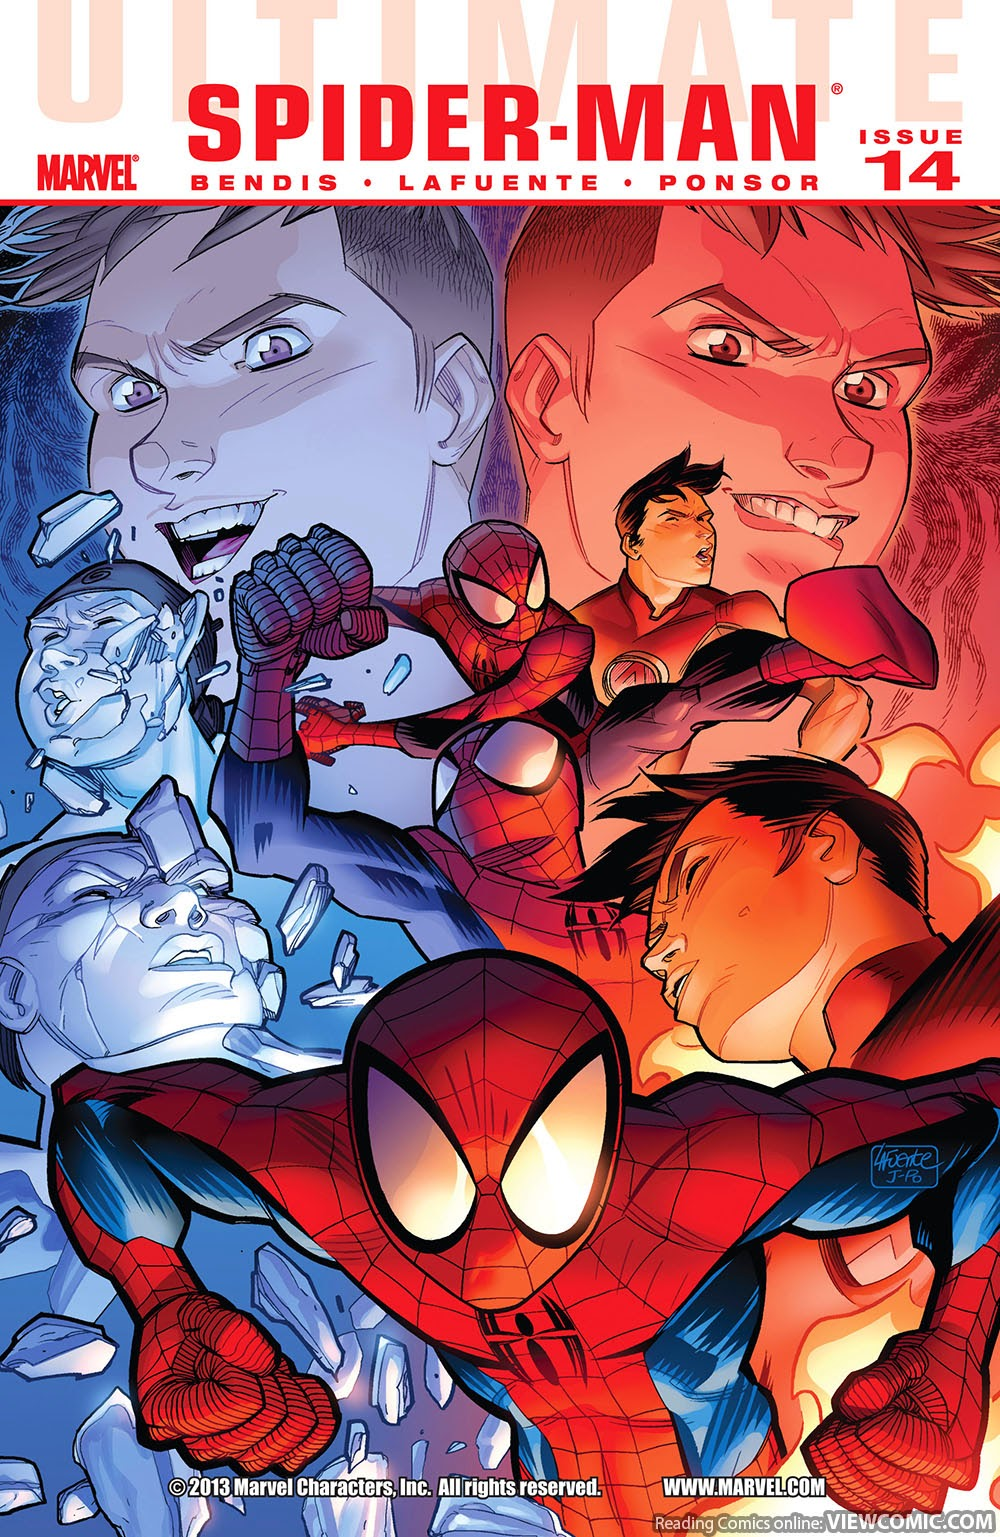 Spiderman Comics Pdf In English